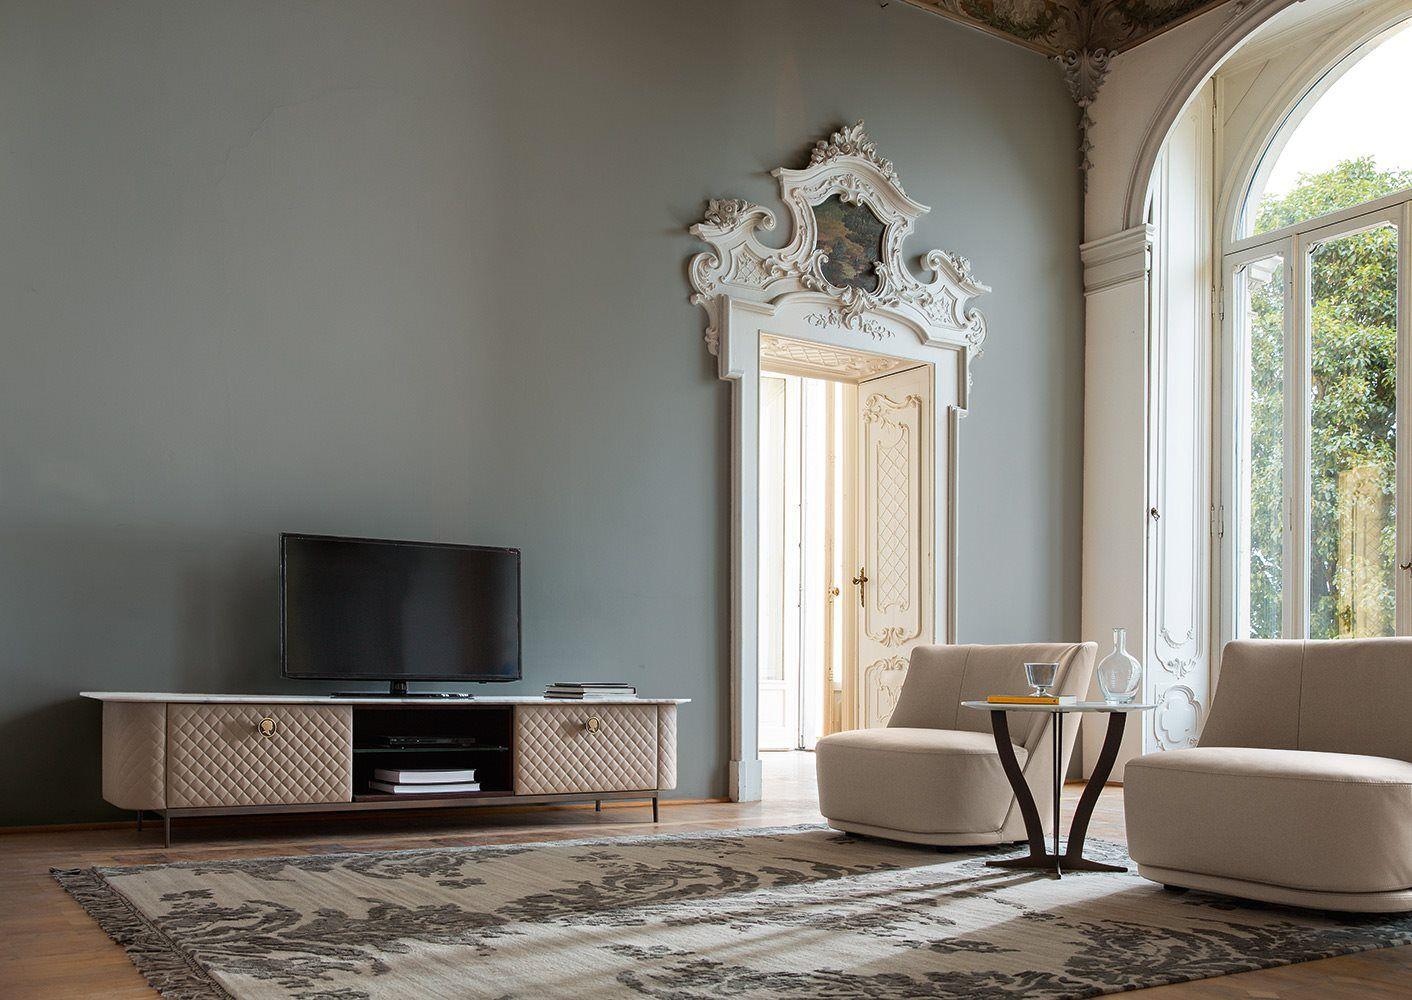 Fernsehmöbel art deco stil holz leder penelope by castello